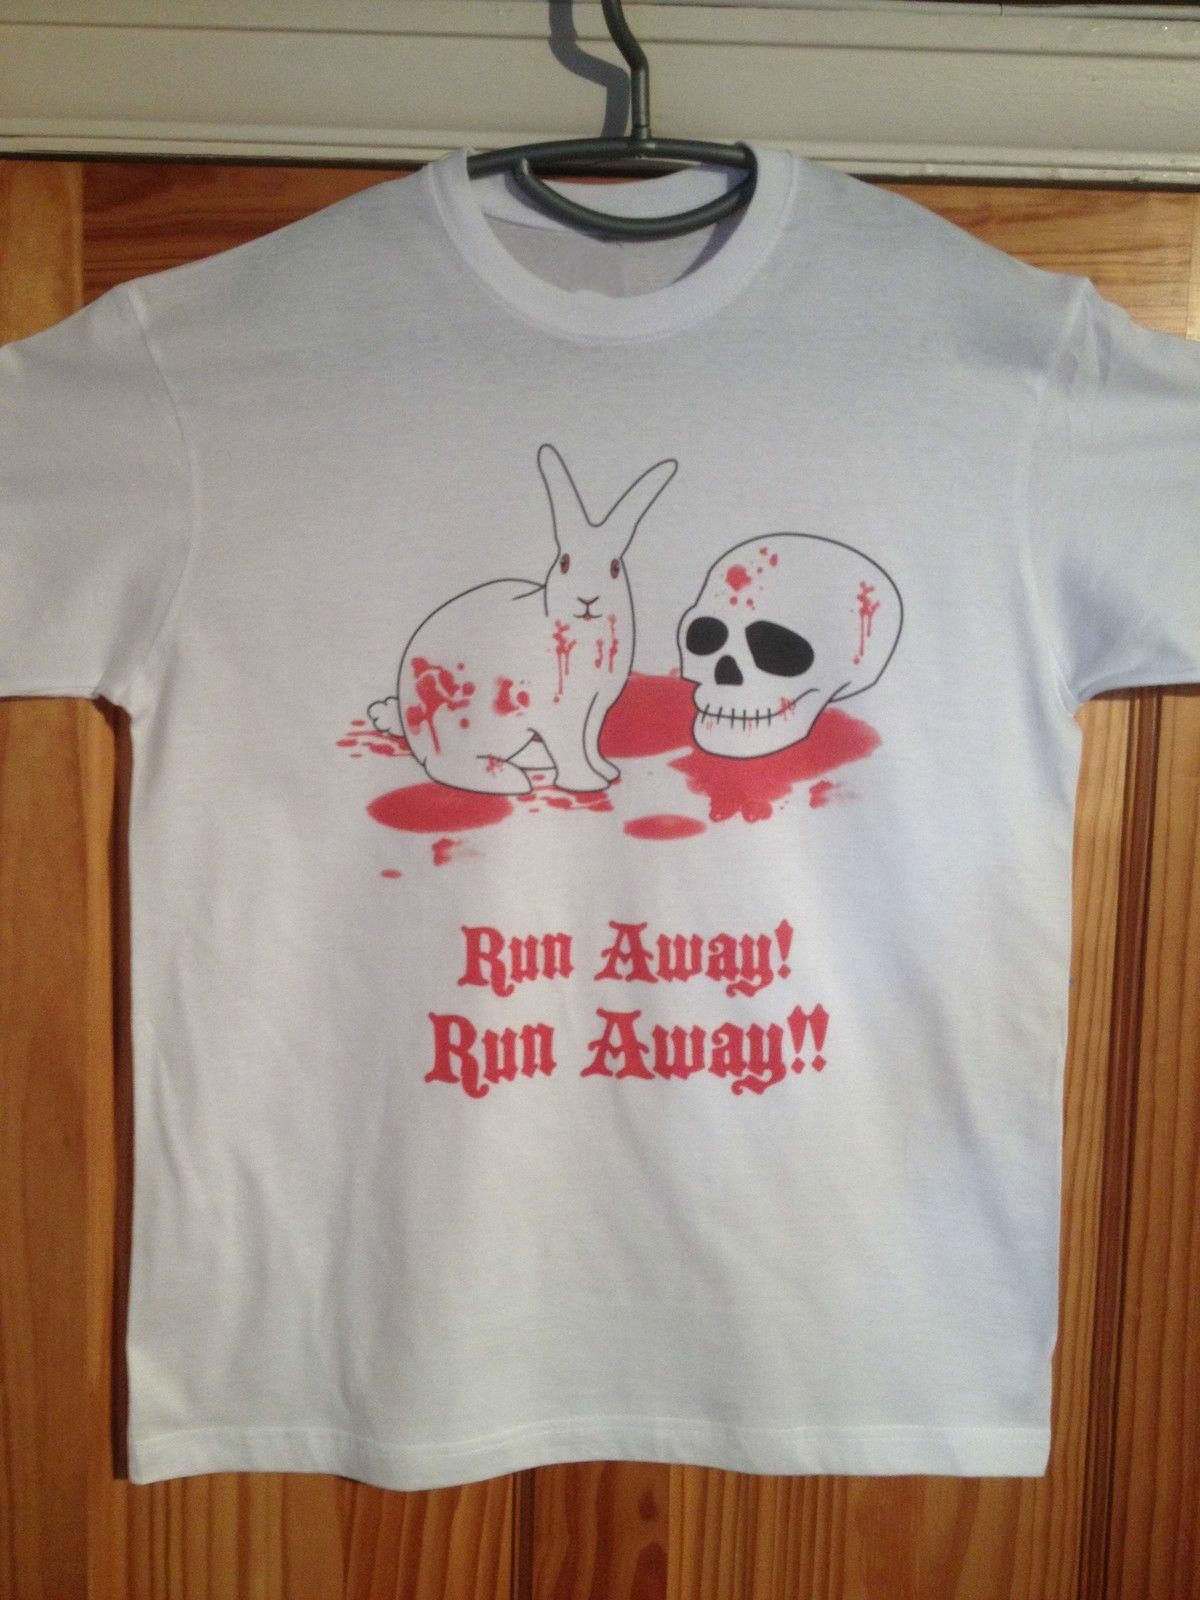 6950990c6 Monty Python T Shirt Killer Rabbit Away Holy Grail Print T Shirt Men Summer  Style Fashion Top Tee Men Summer T Shirt Shopping T Shirt Online Cool T  Shirt ...